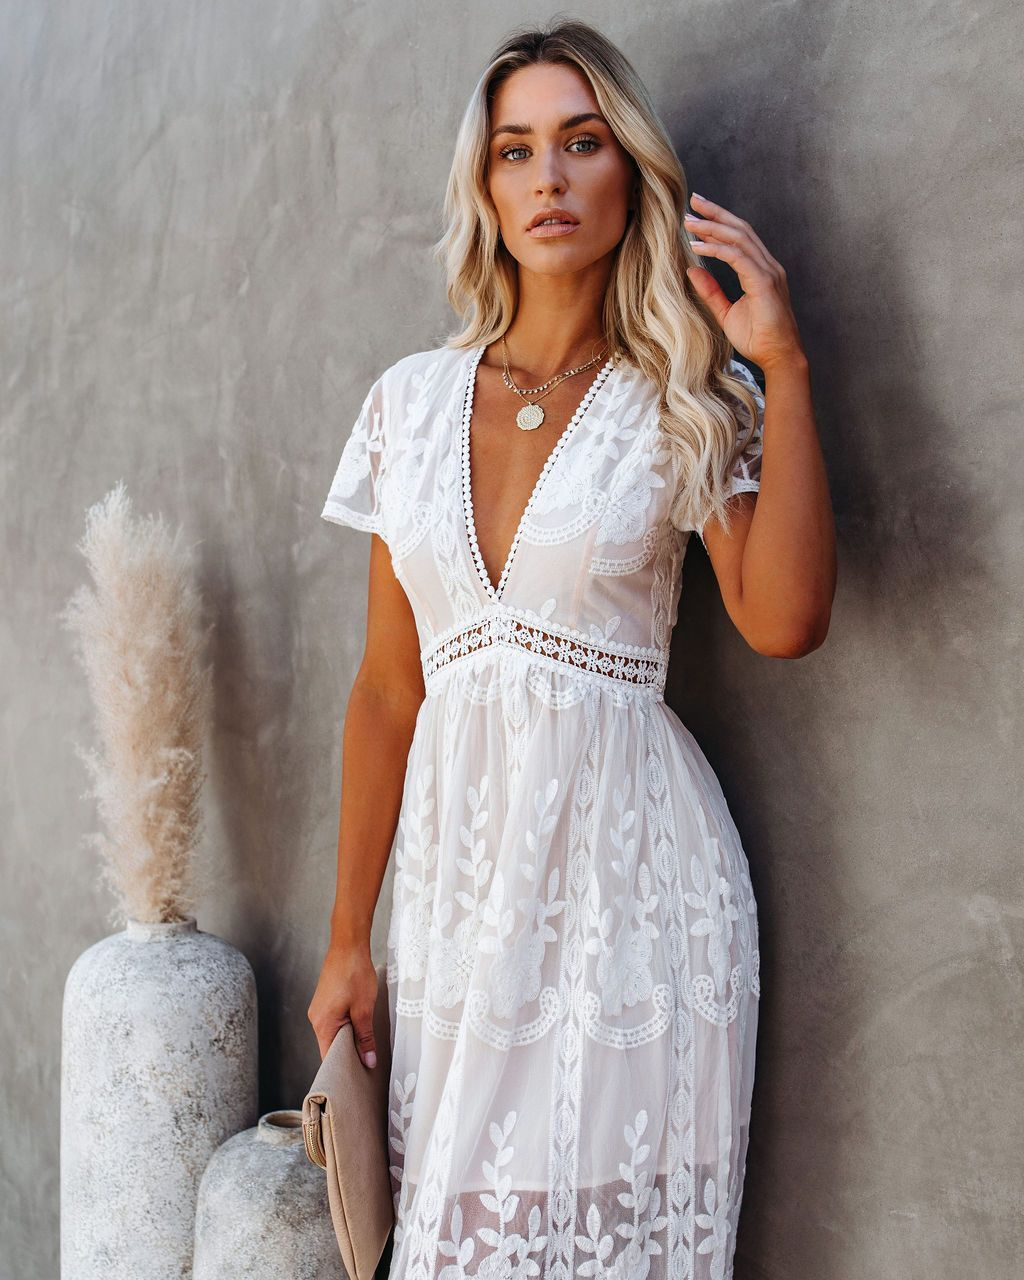 Rebecca Dress Floral Lace Maxi Dress Boho Dresses Long Lace Dress Boho [ 1280 x 1024 Pixel ]